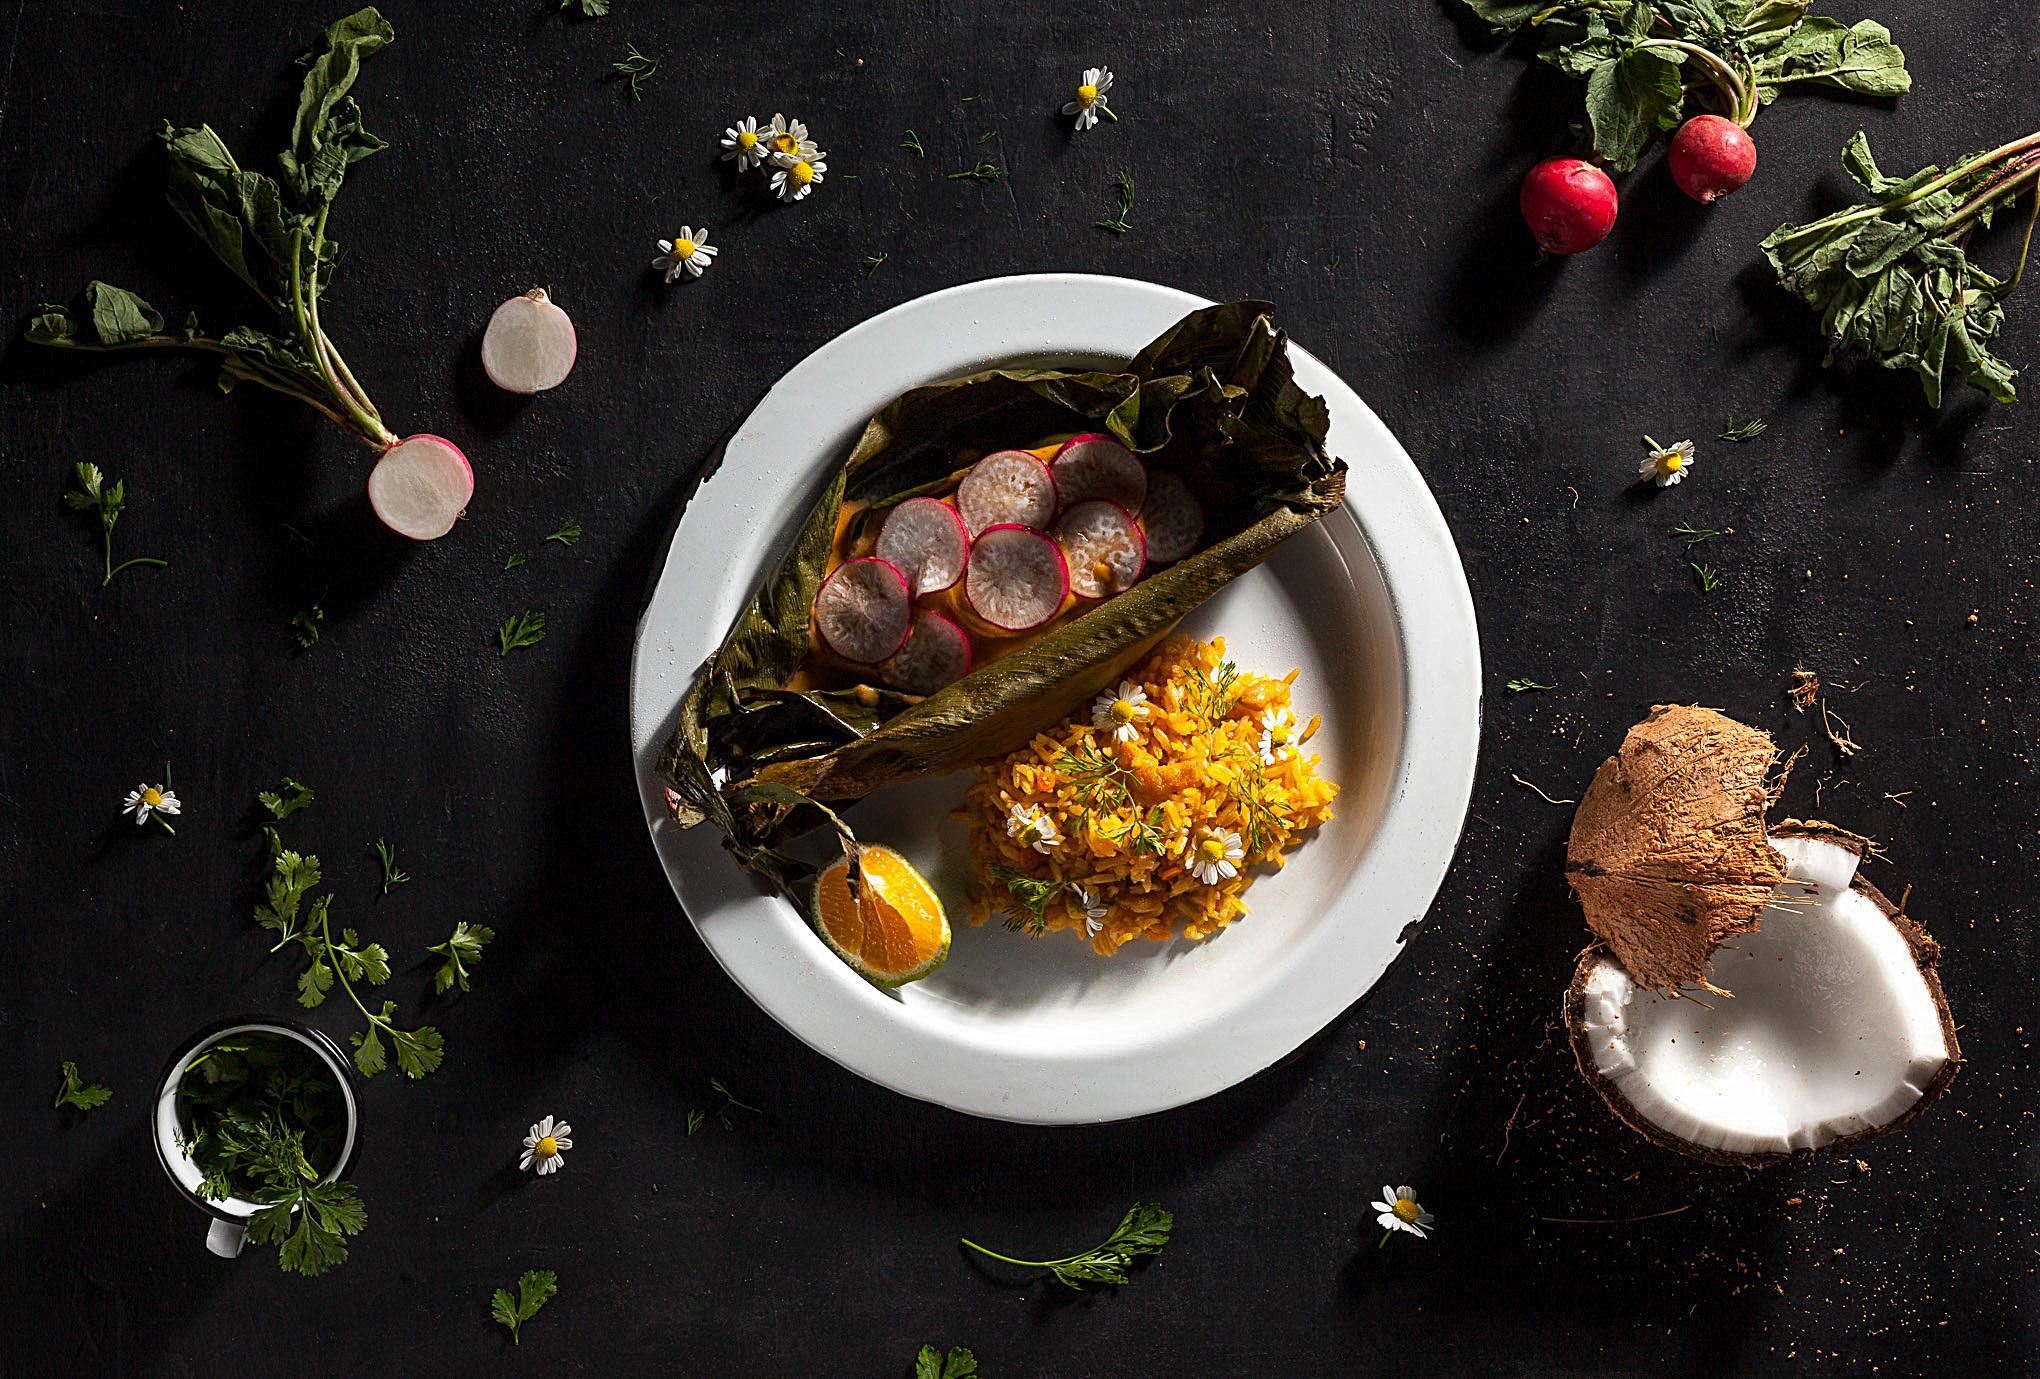 Pasto Capital Gastrodivrsa - 2019 (25)